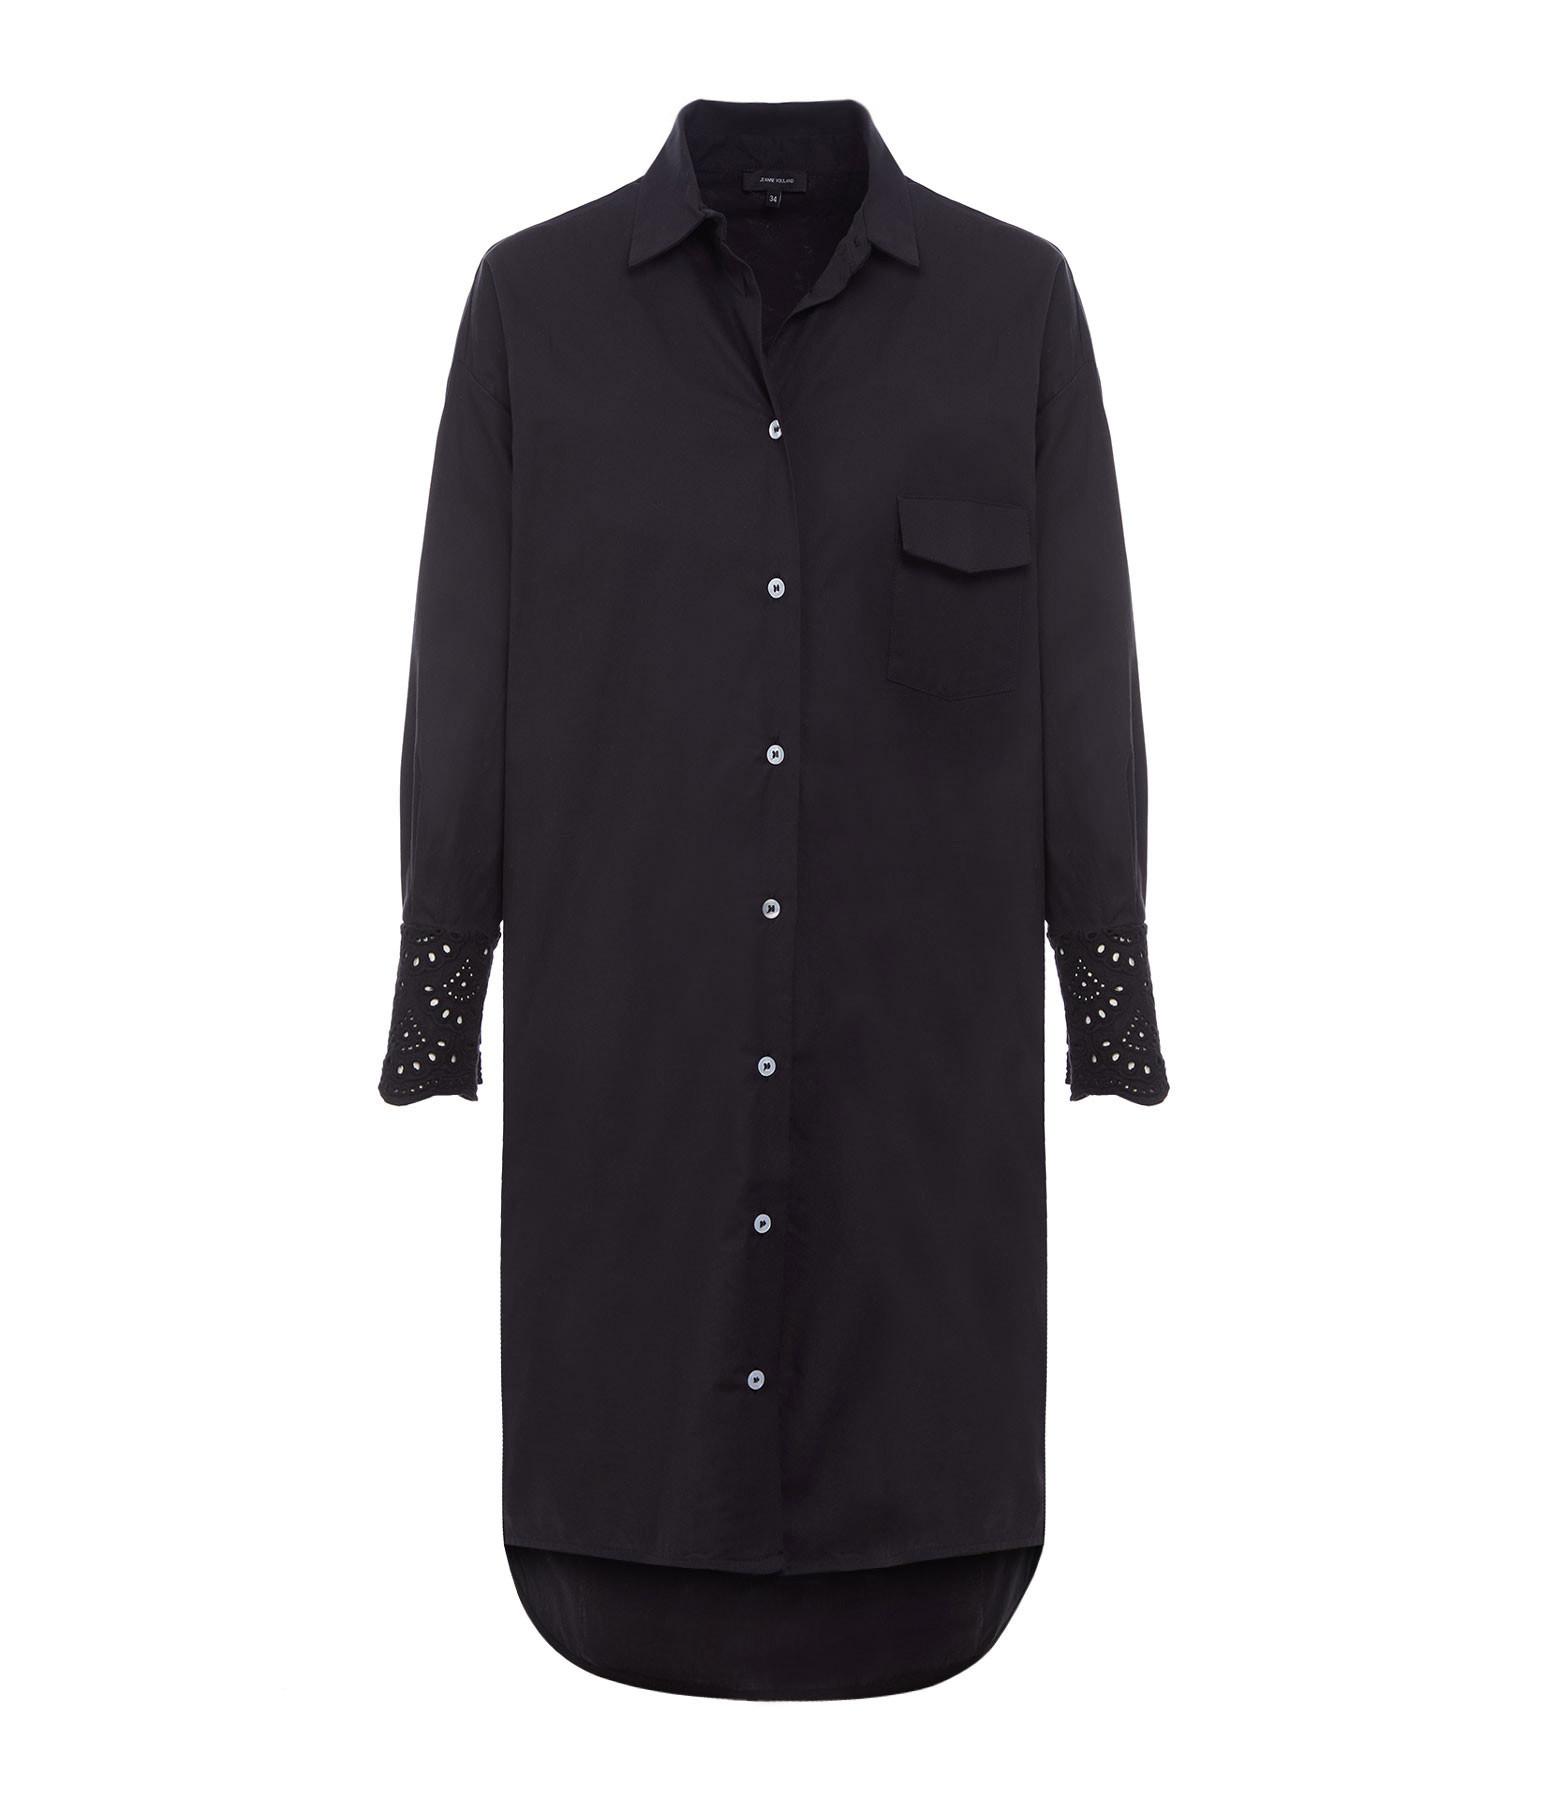 JEANNE VOULAND - Robe Chemise Feith Broderie Anglaise Coton Noir